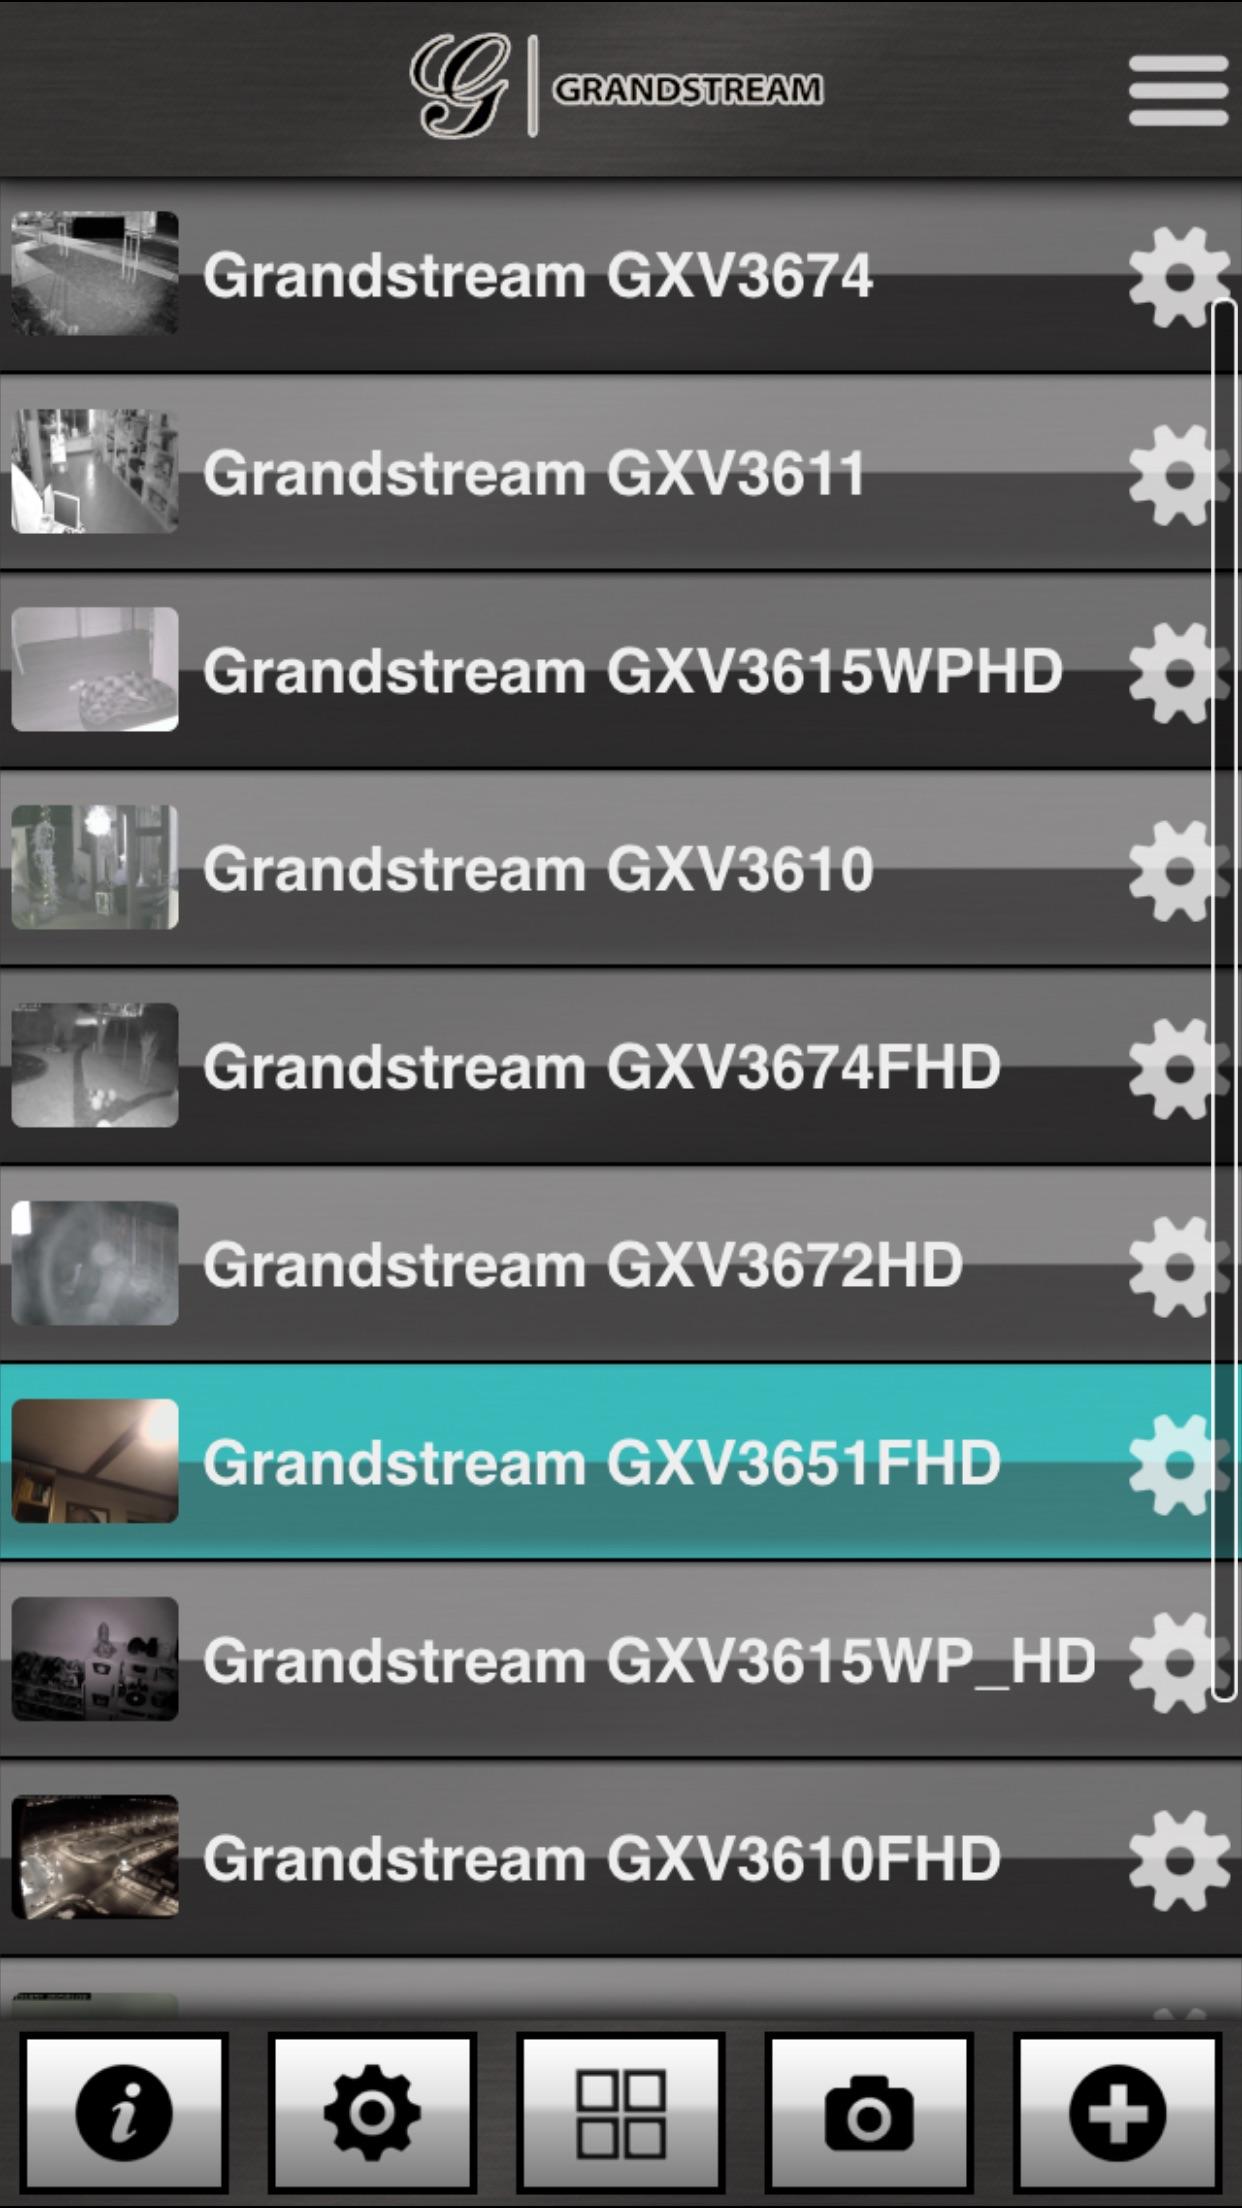 Grandstream FC Screenshot